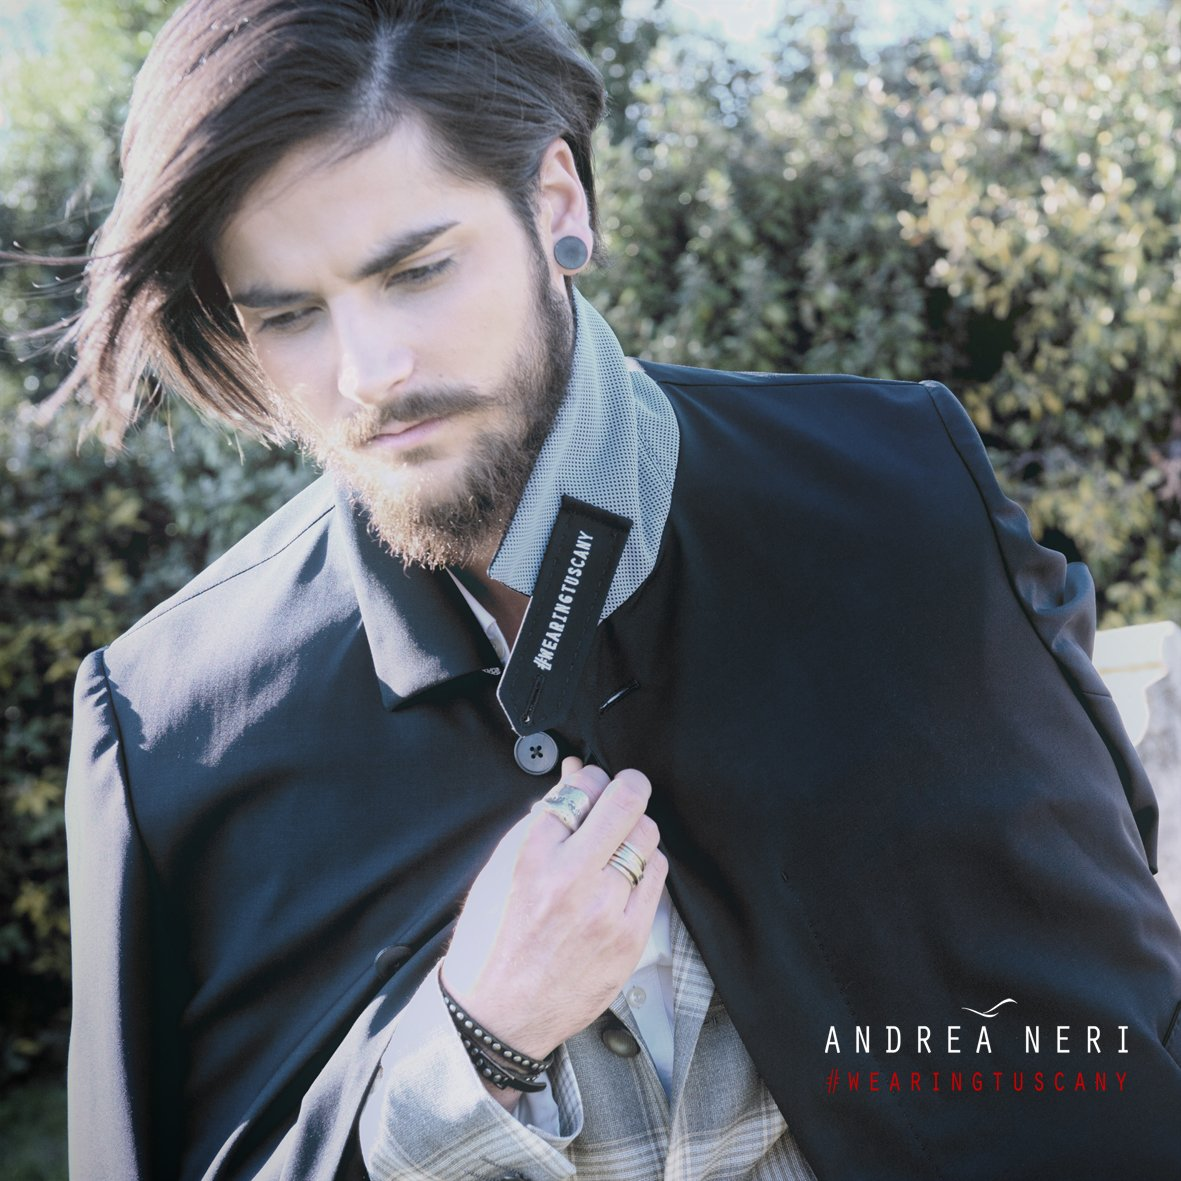 Andrea Neri Nude Photos 2